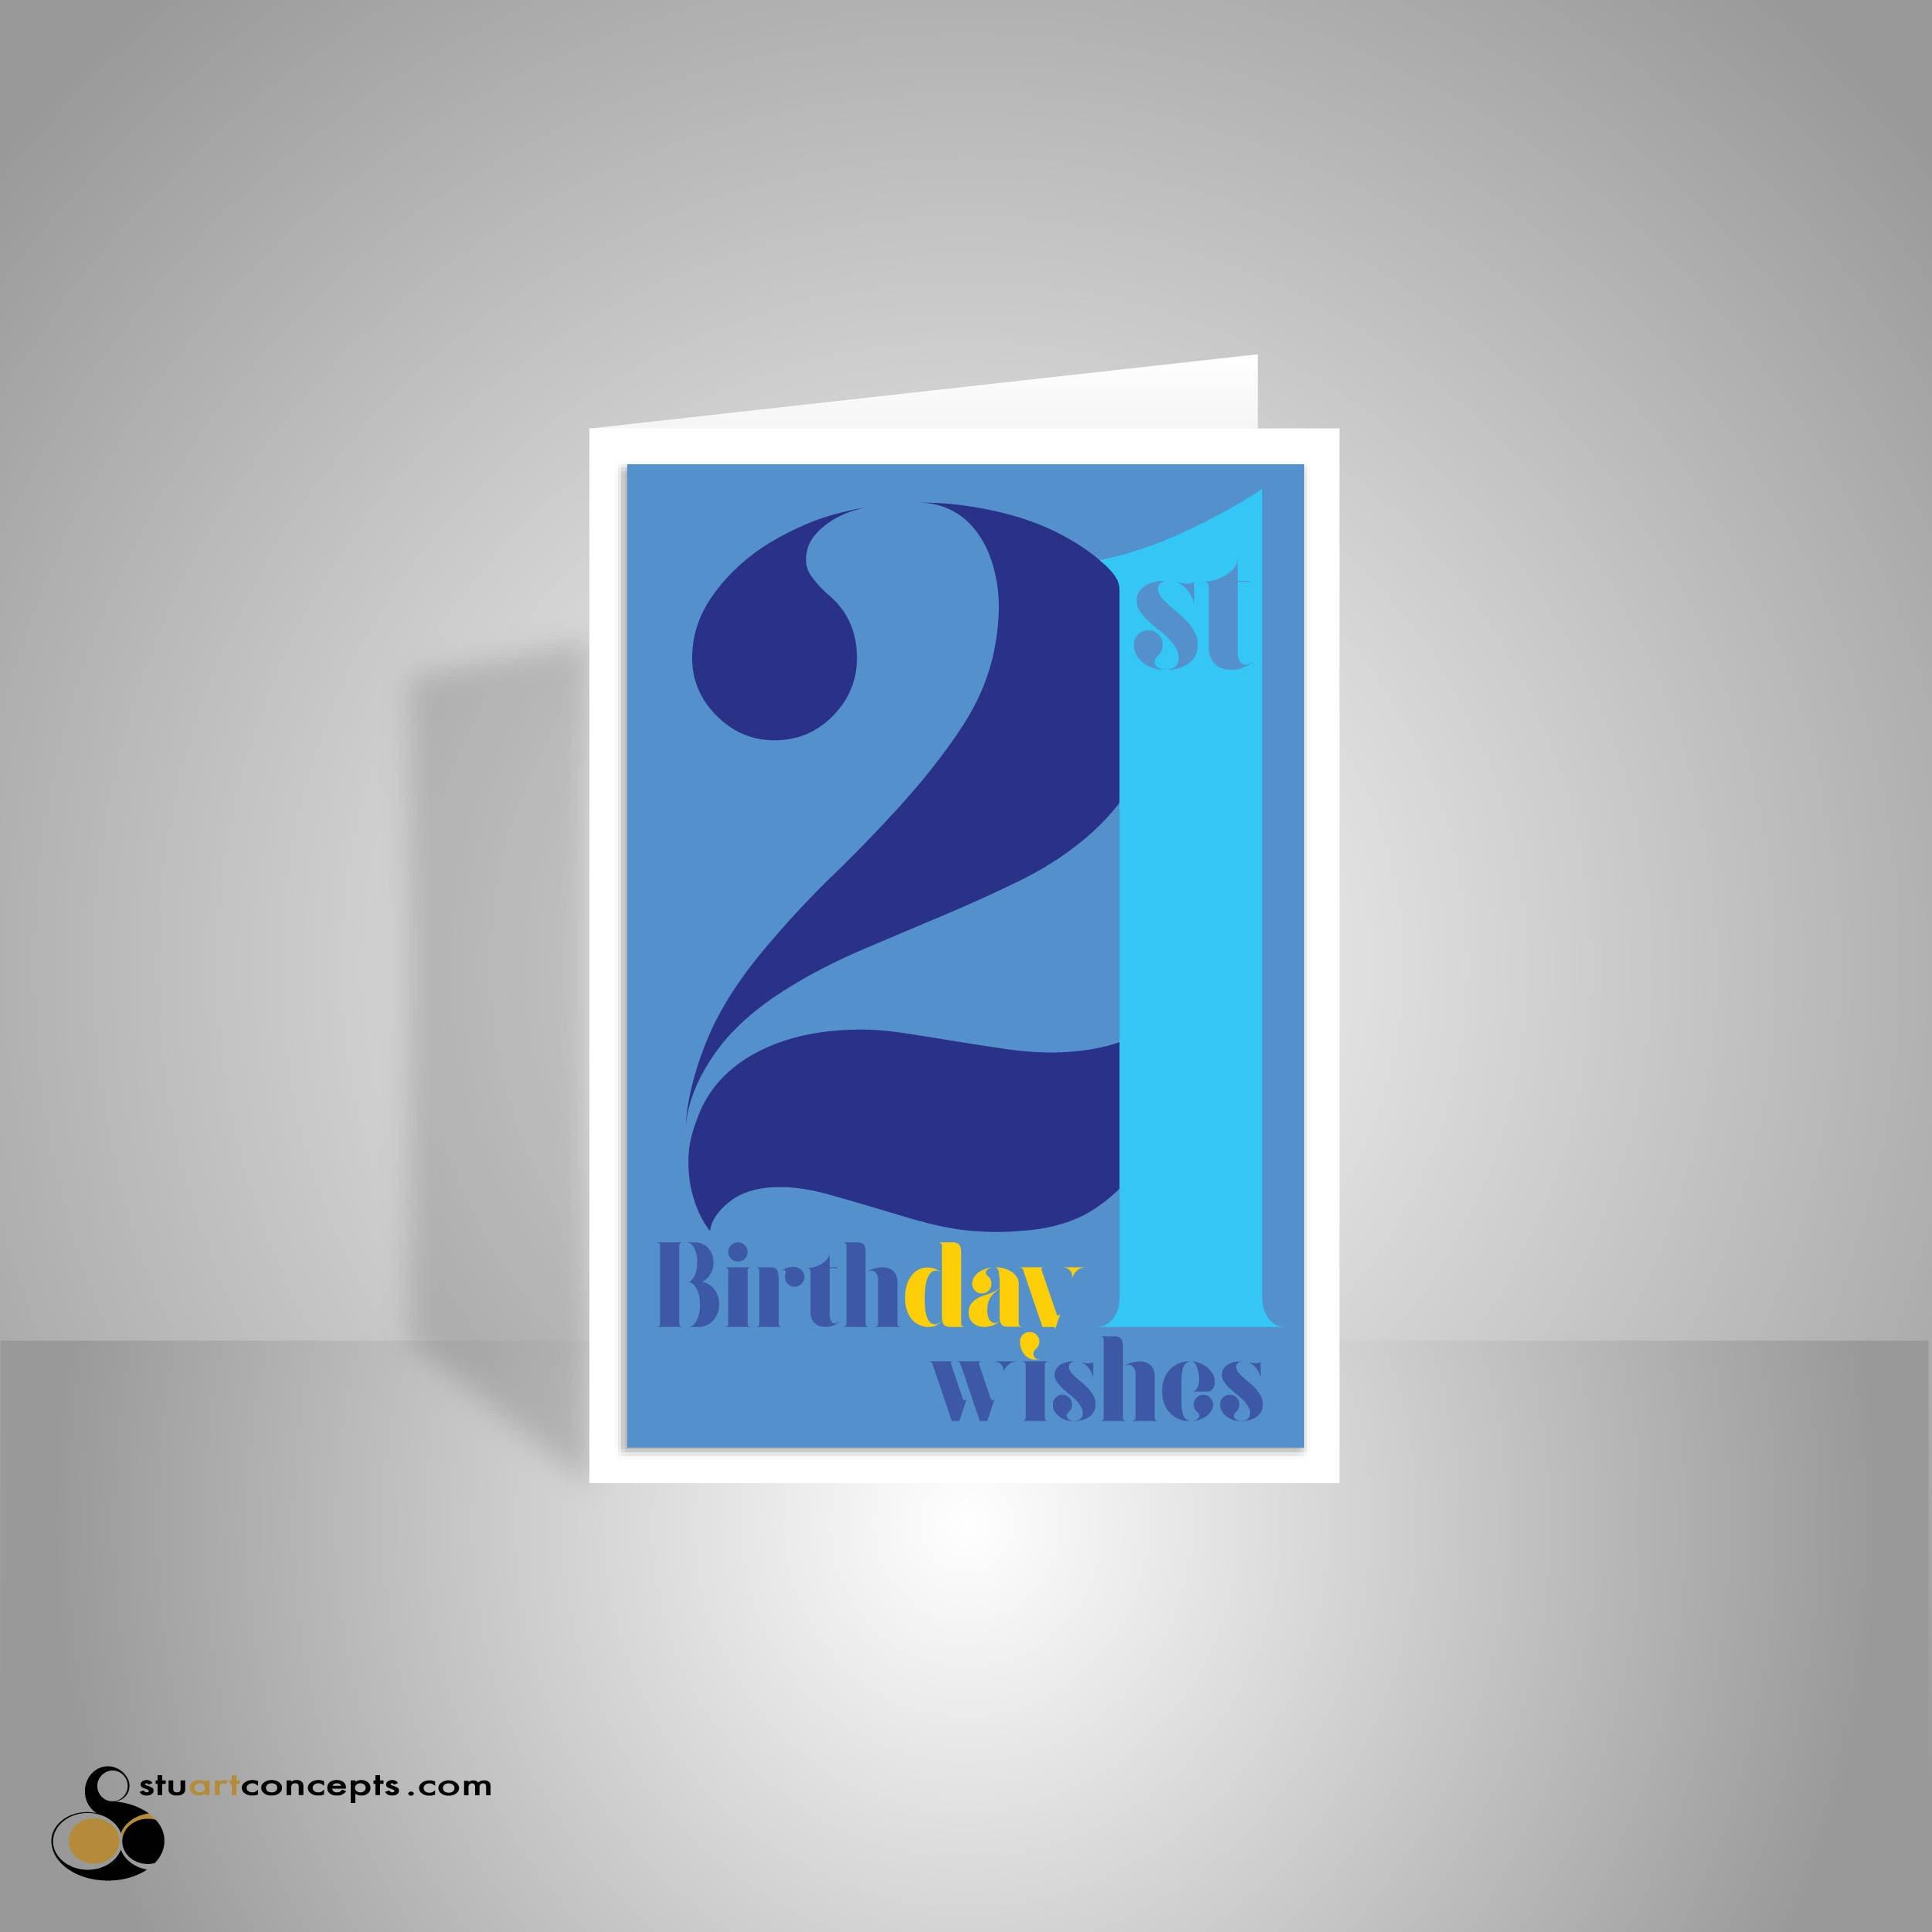 21st Birthday Wishes Card For Boy Or Man 21 Happy Birthday